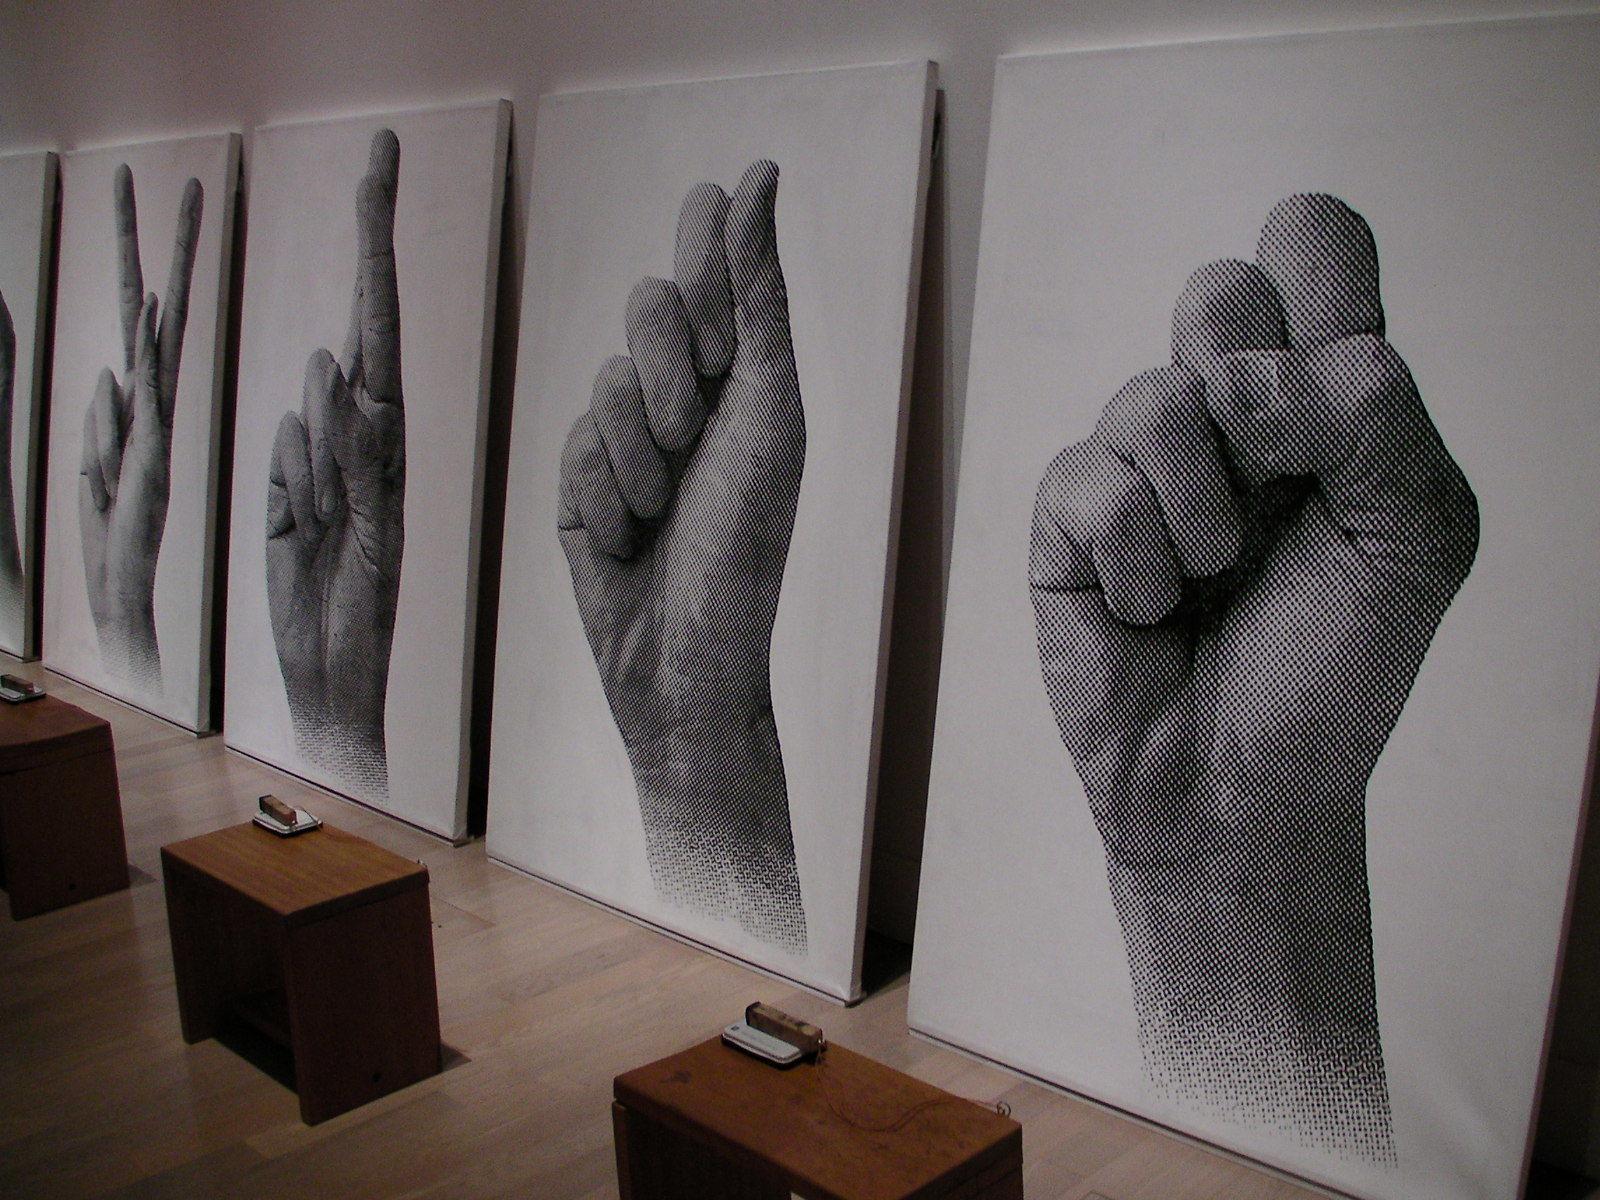 FX ハルソノ《声なき声》1993-94年 パネルの手前には指文字に対応するアルファベットが刻まれたスタンプが置かれ、鑑賞者は自由に紙に押すことができる。